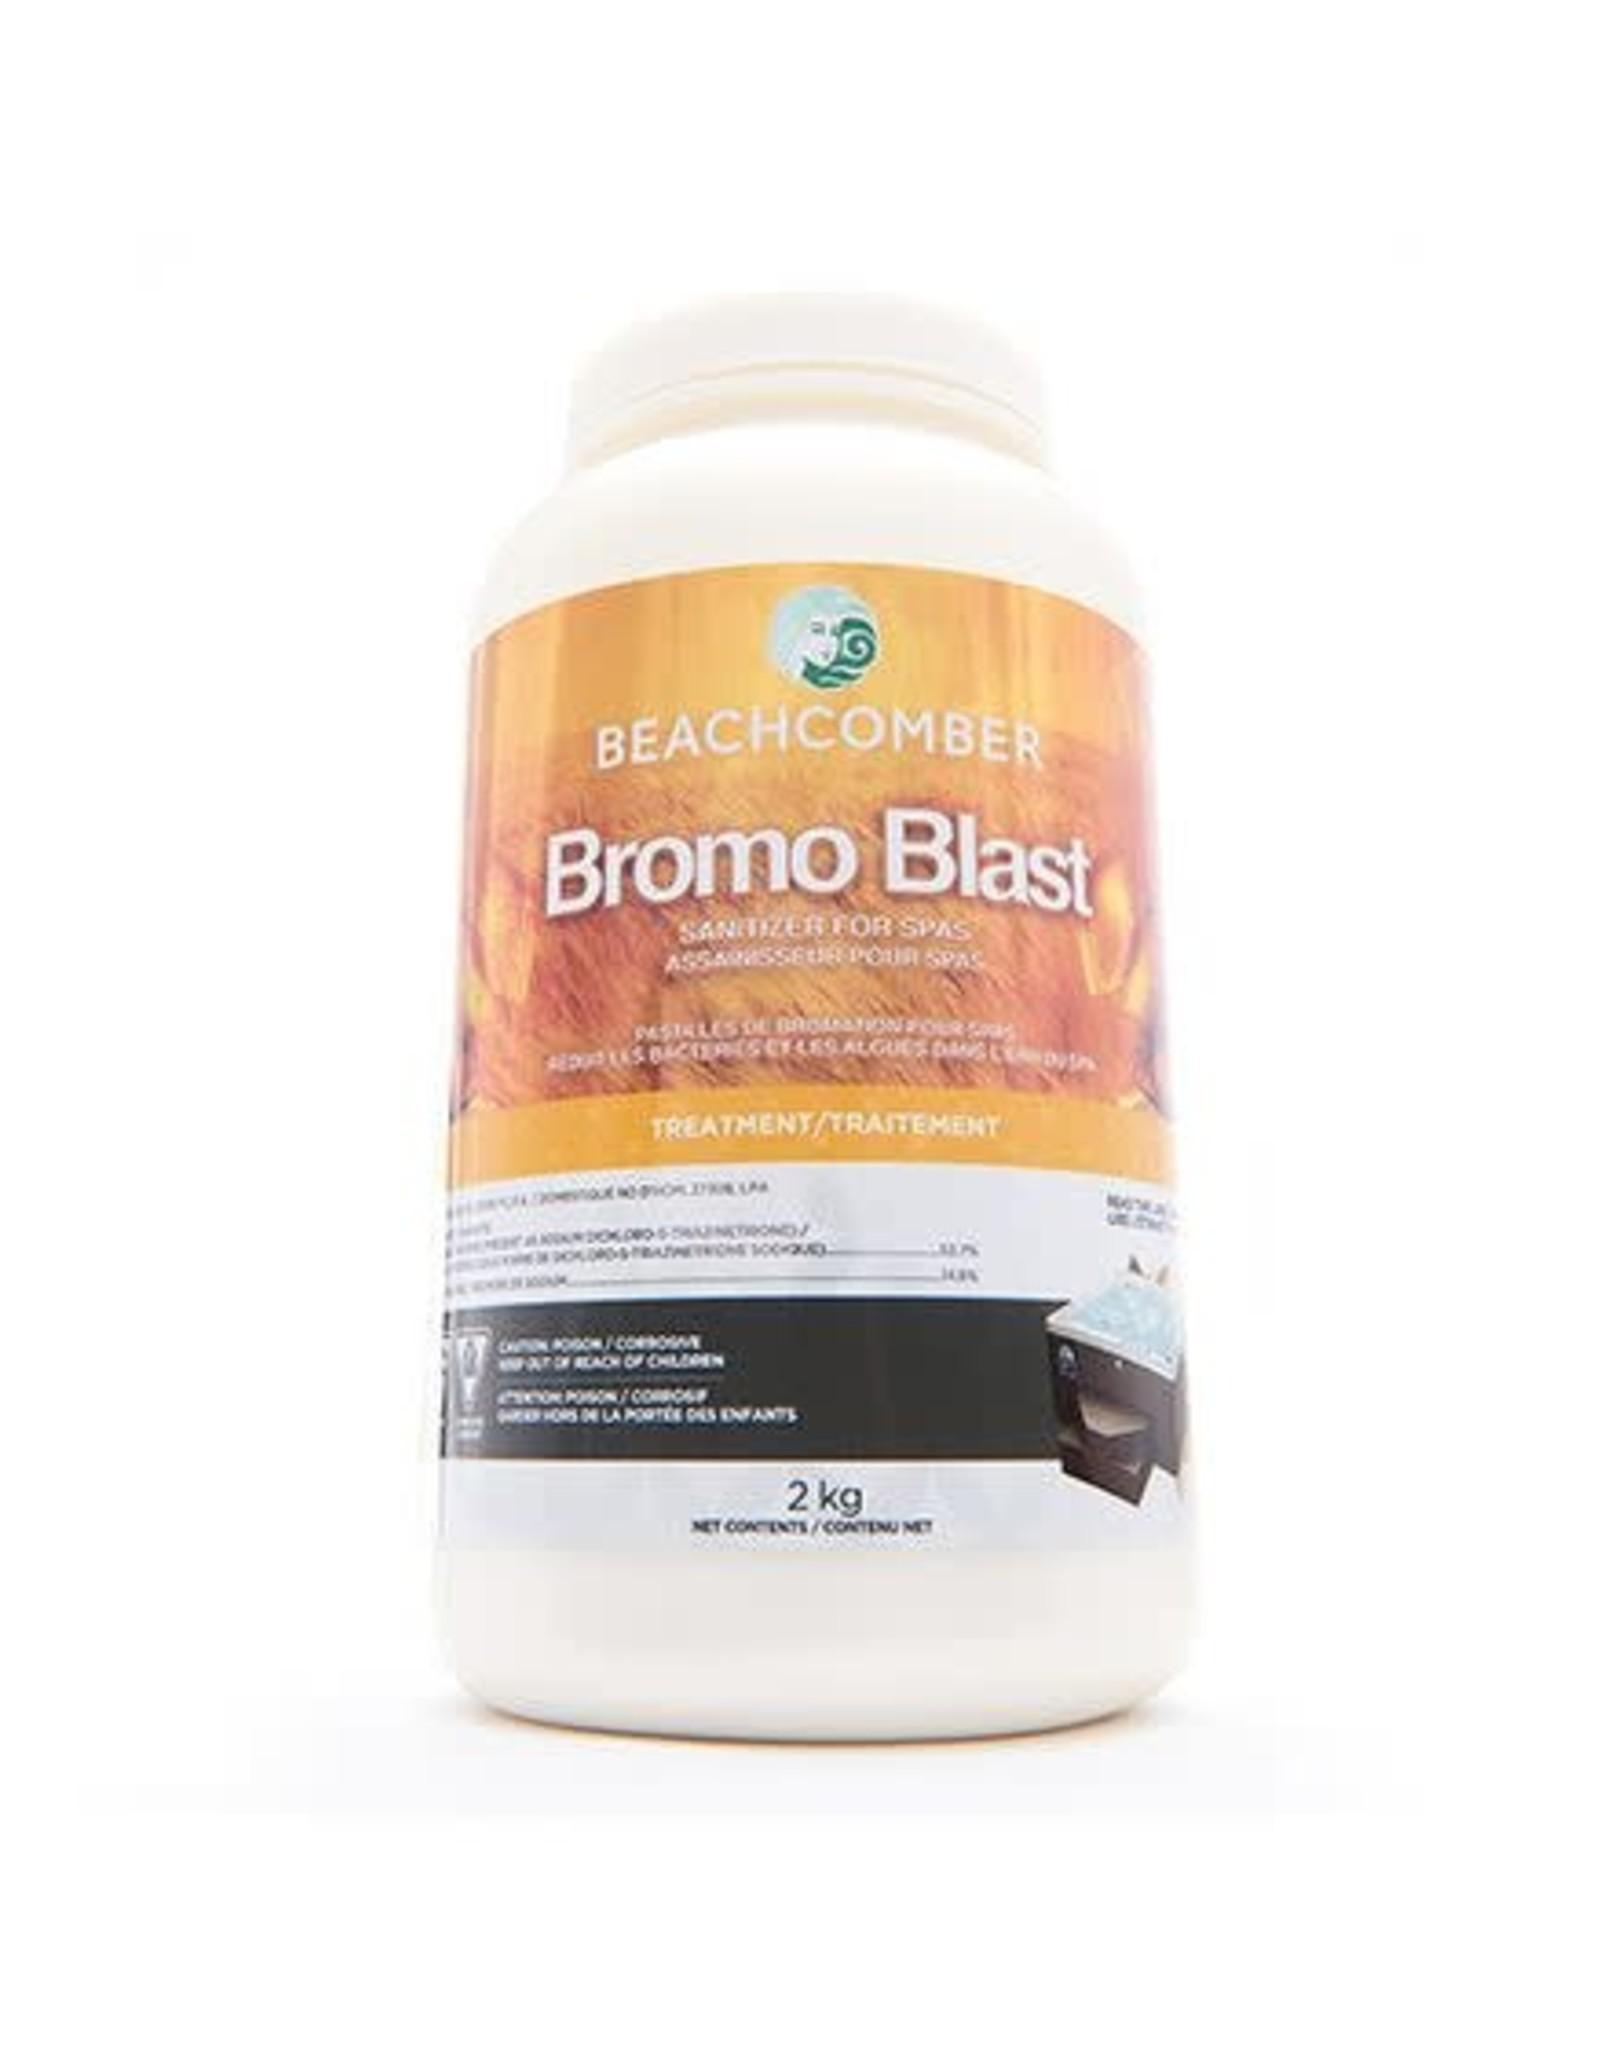 BEACHCOMBER BEACHCOMBER Bromo Blast (2kg) - Sanitizer